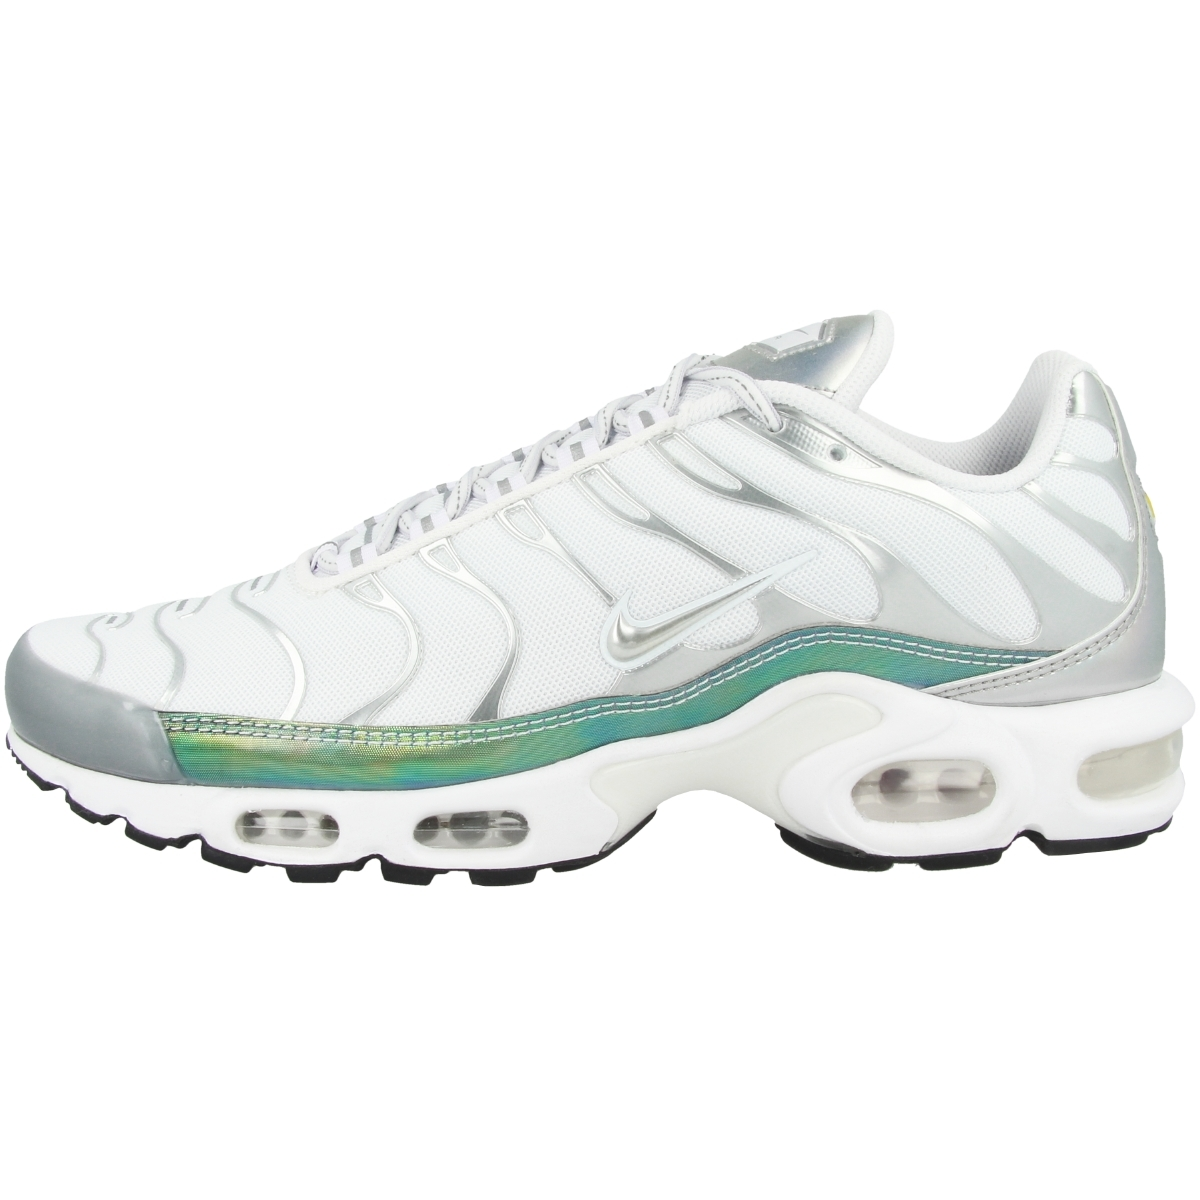 Nike Air Max Plus TN Sneaker Schuhe Herren Sportschuhe